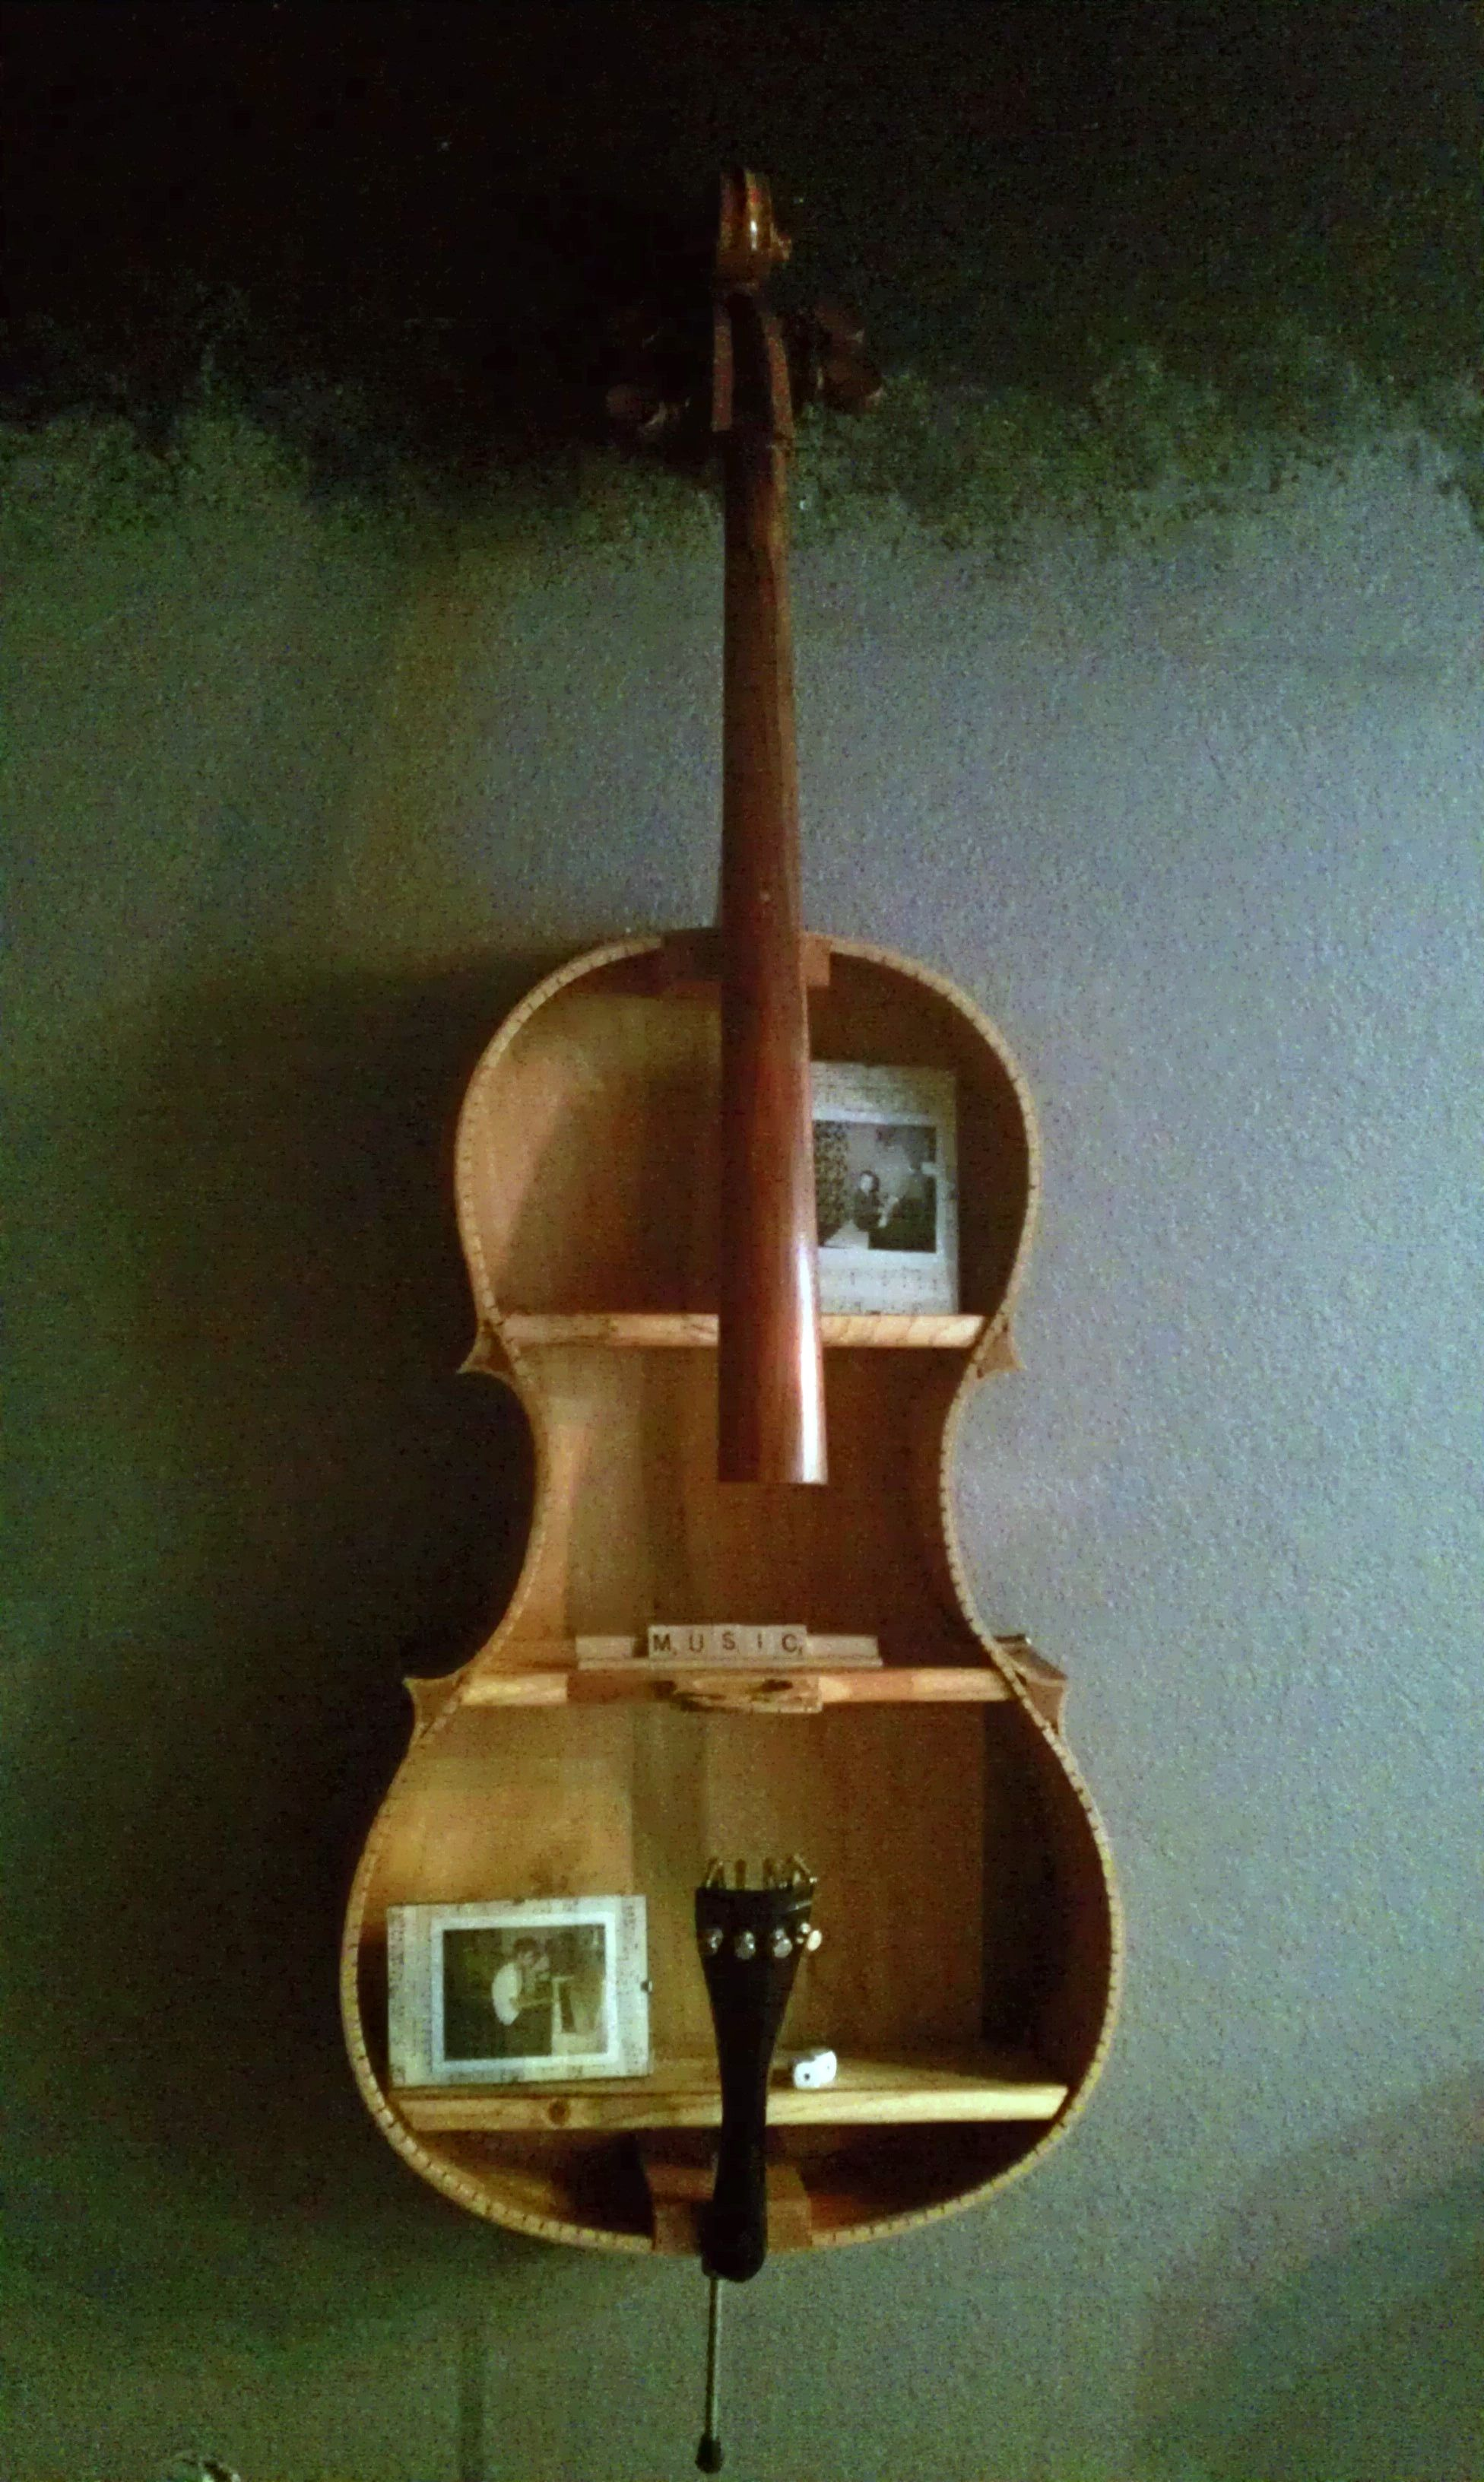 Cello was given to me. had a broken neck beyond repair